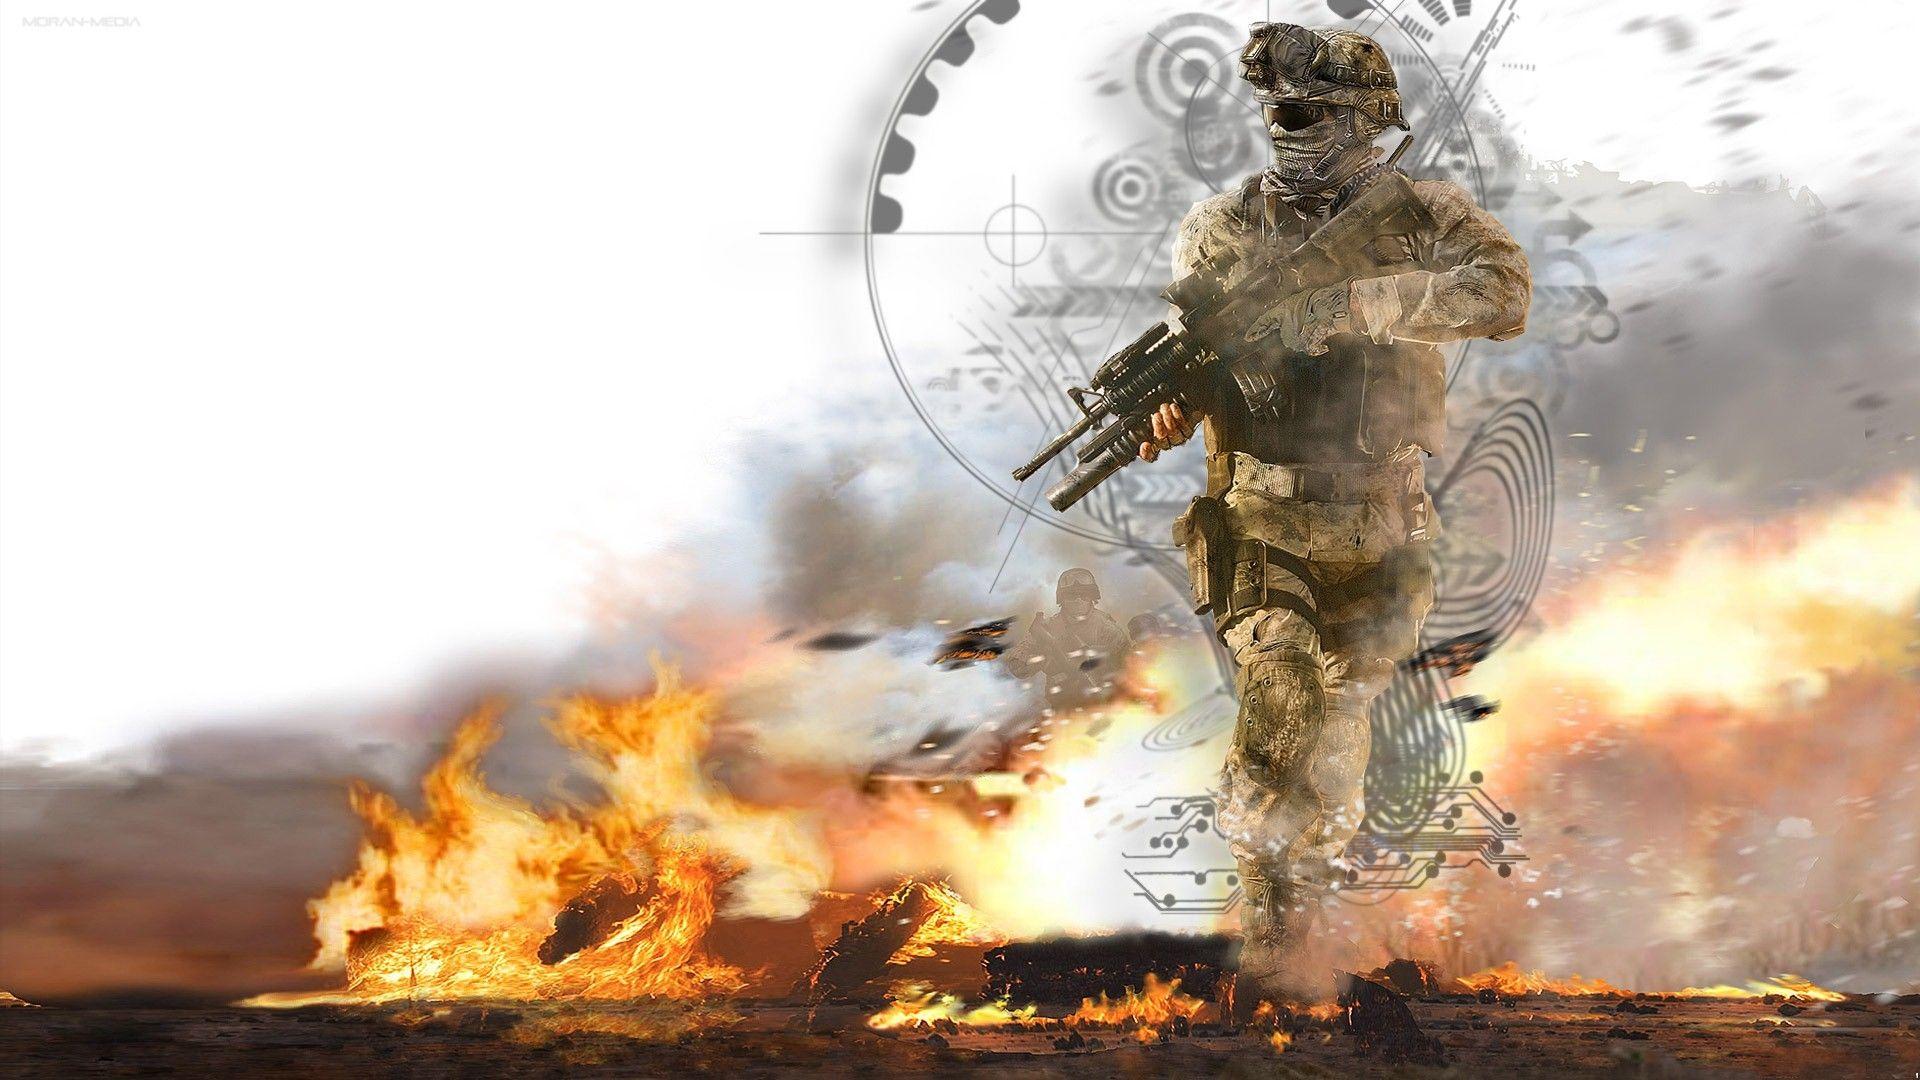 War Army HD Wallpapers, Free Wallpaper Downloads, War Army